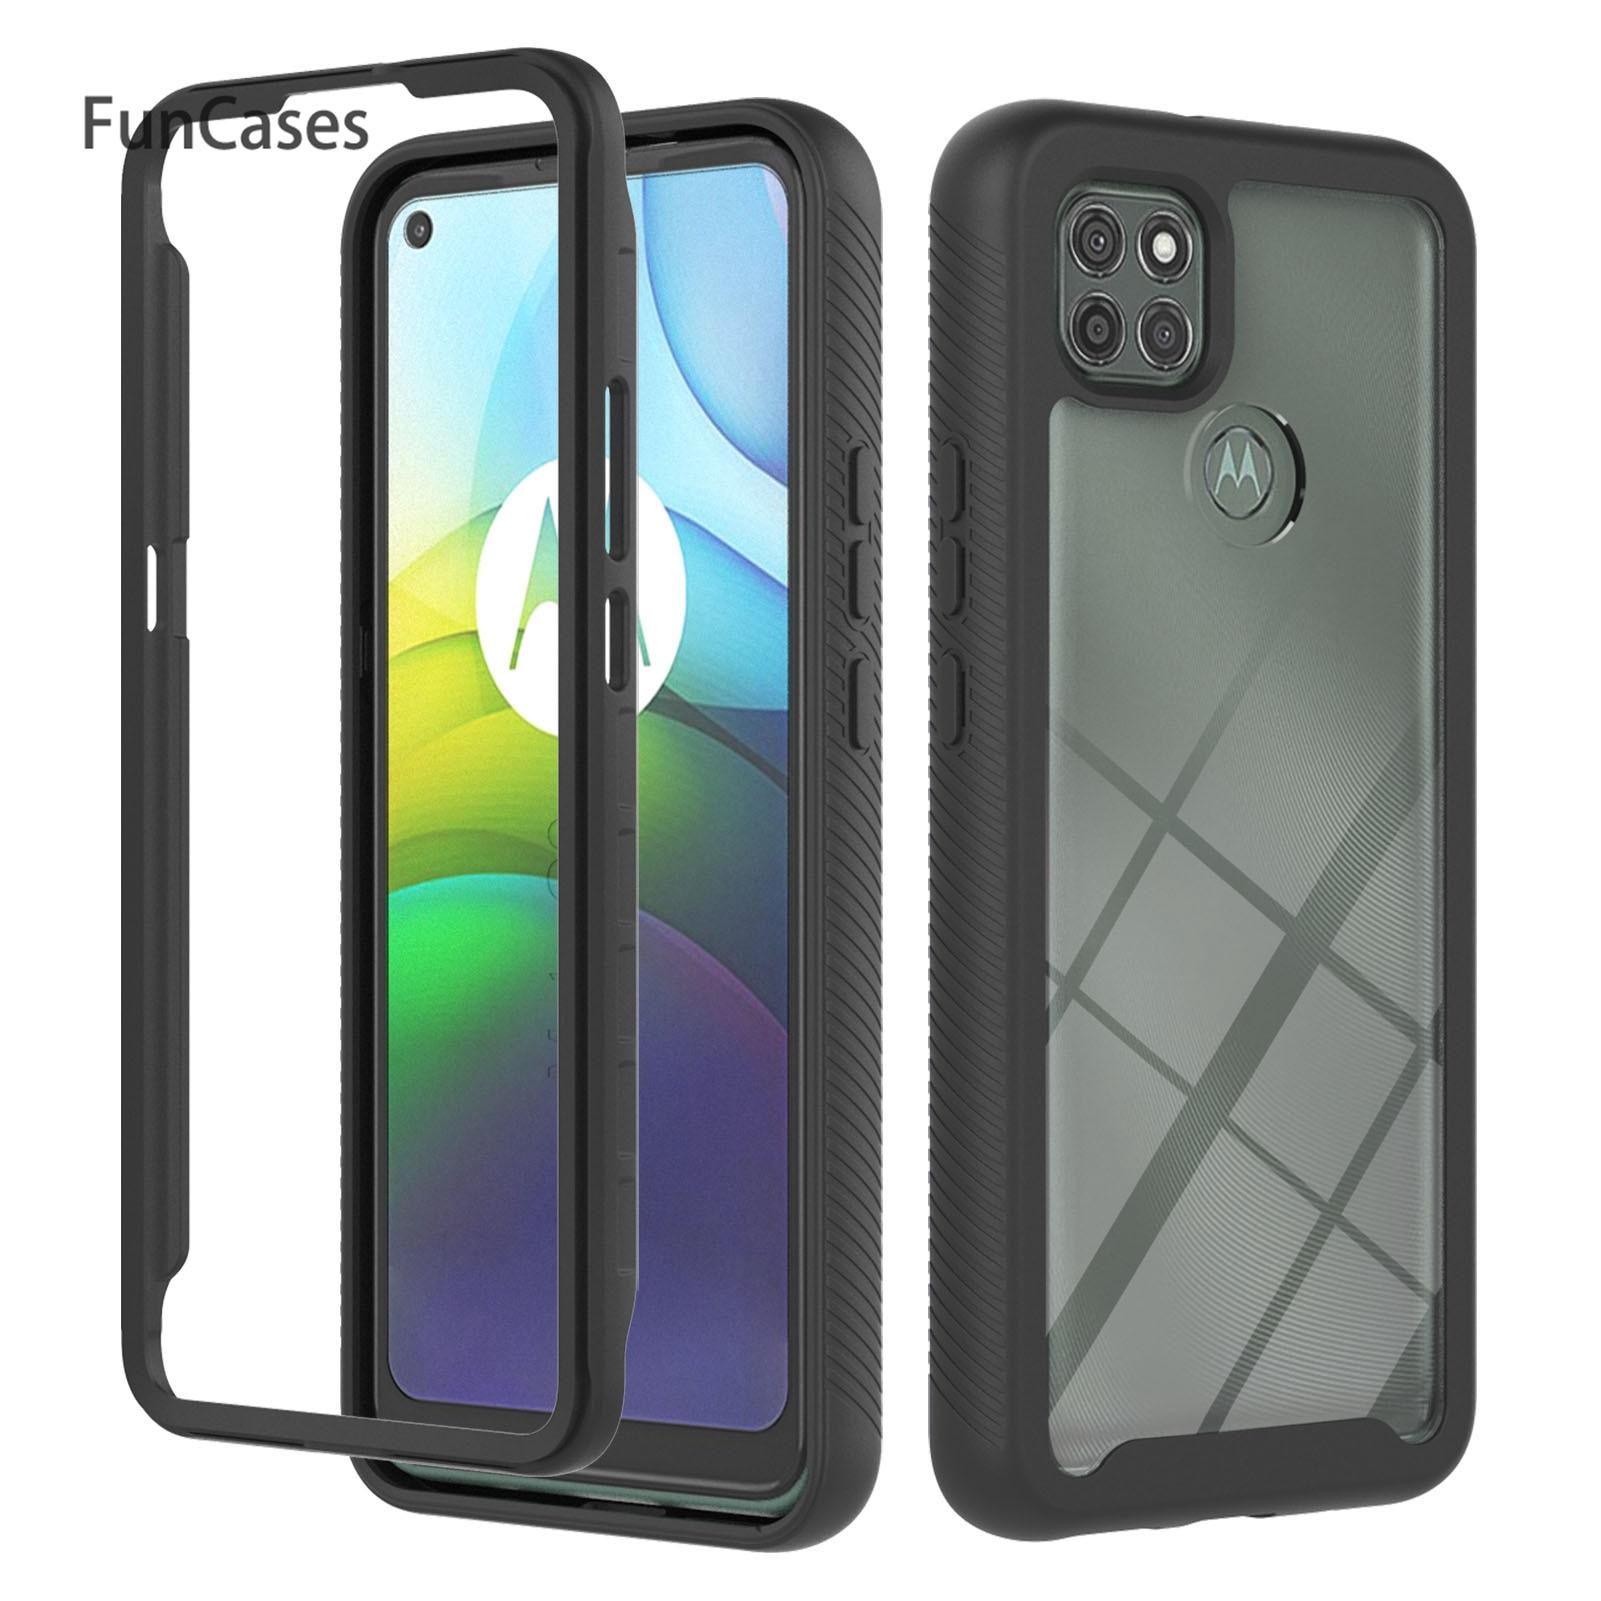 Funda protectora de pantalla de lujo para teléfono móvil, carcasa para accesorios...